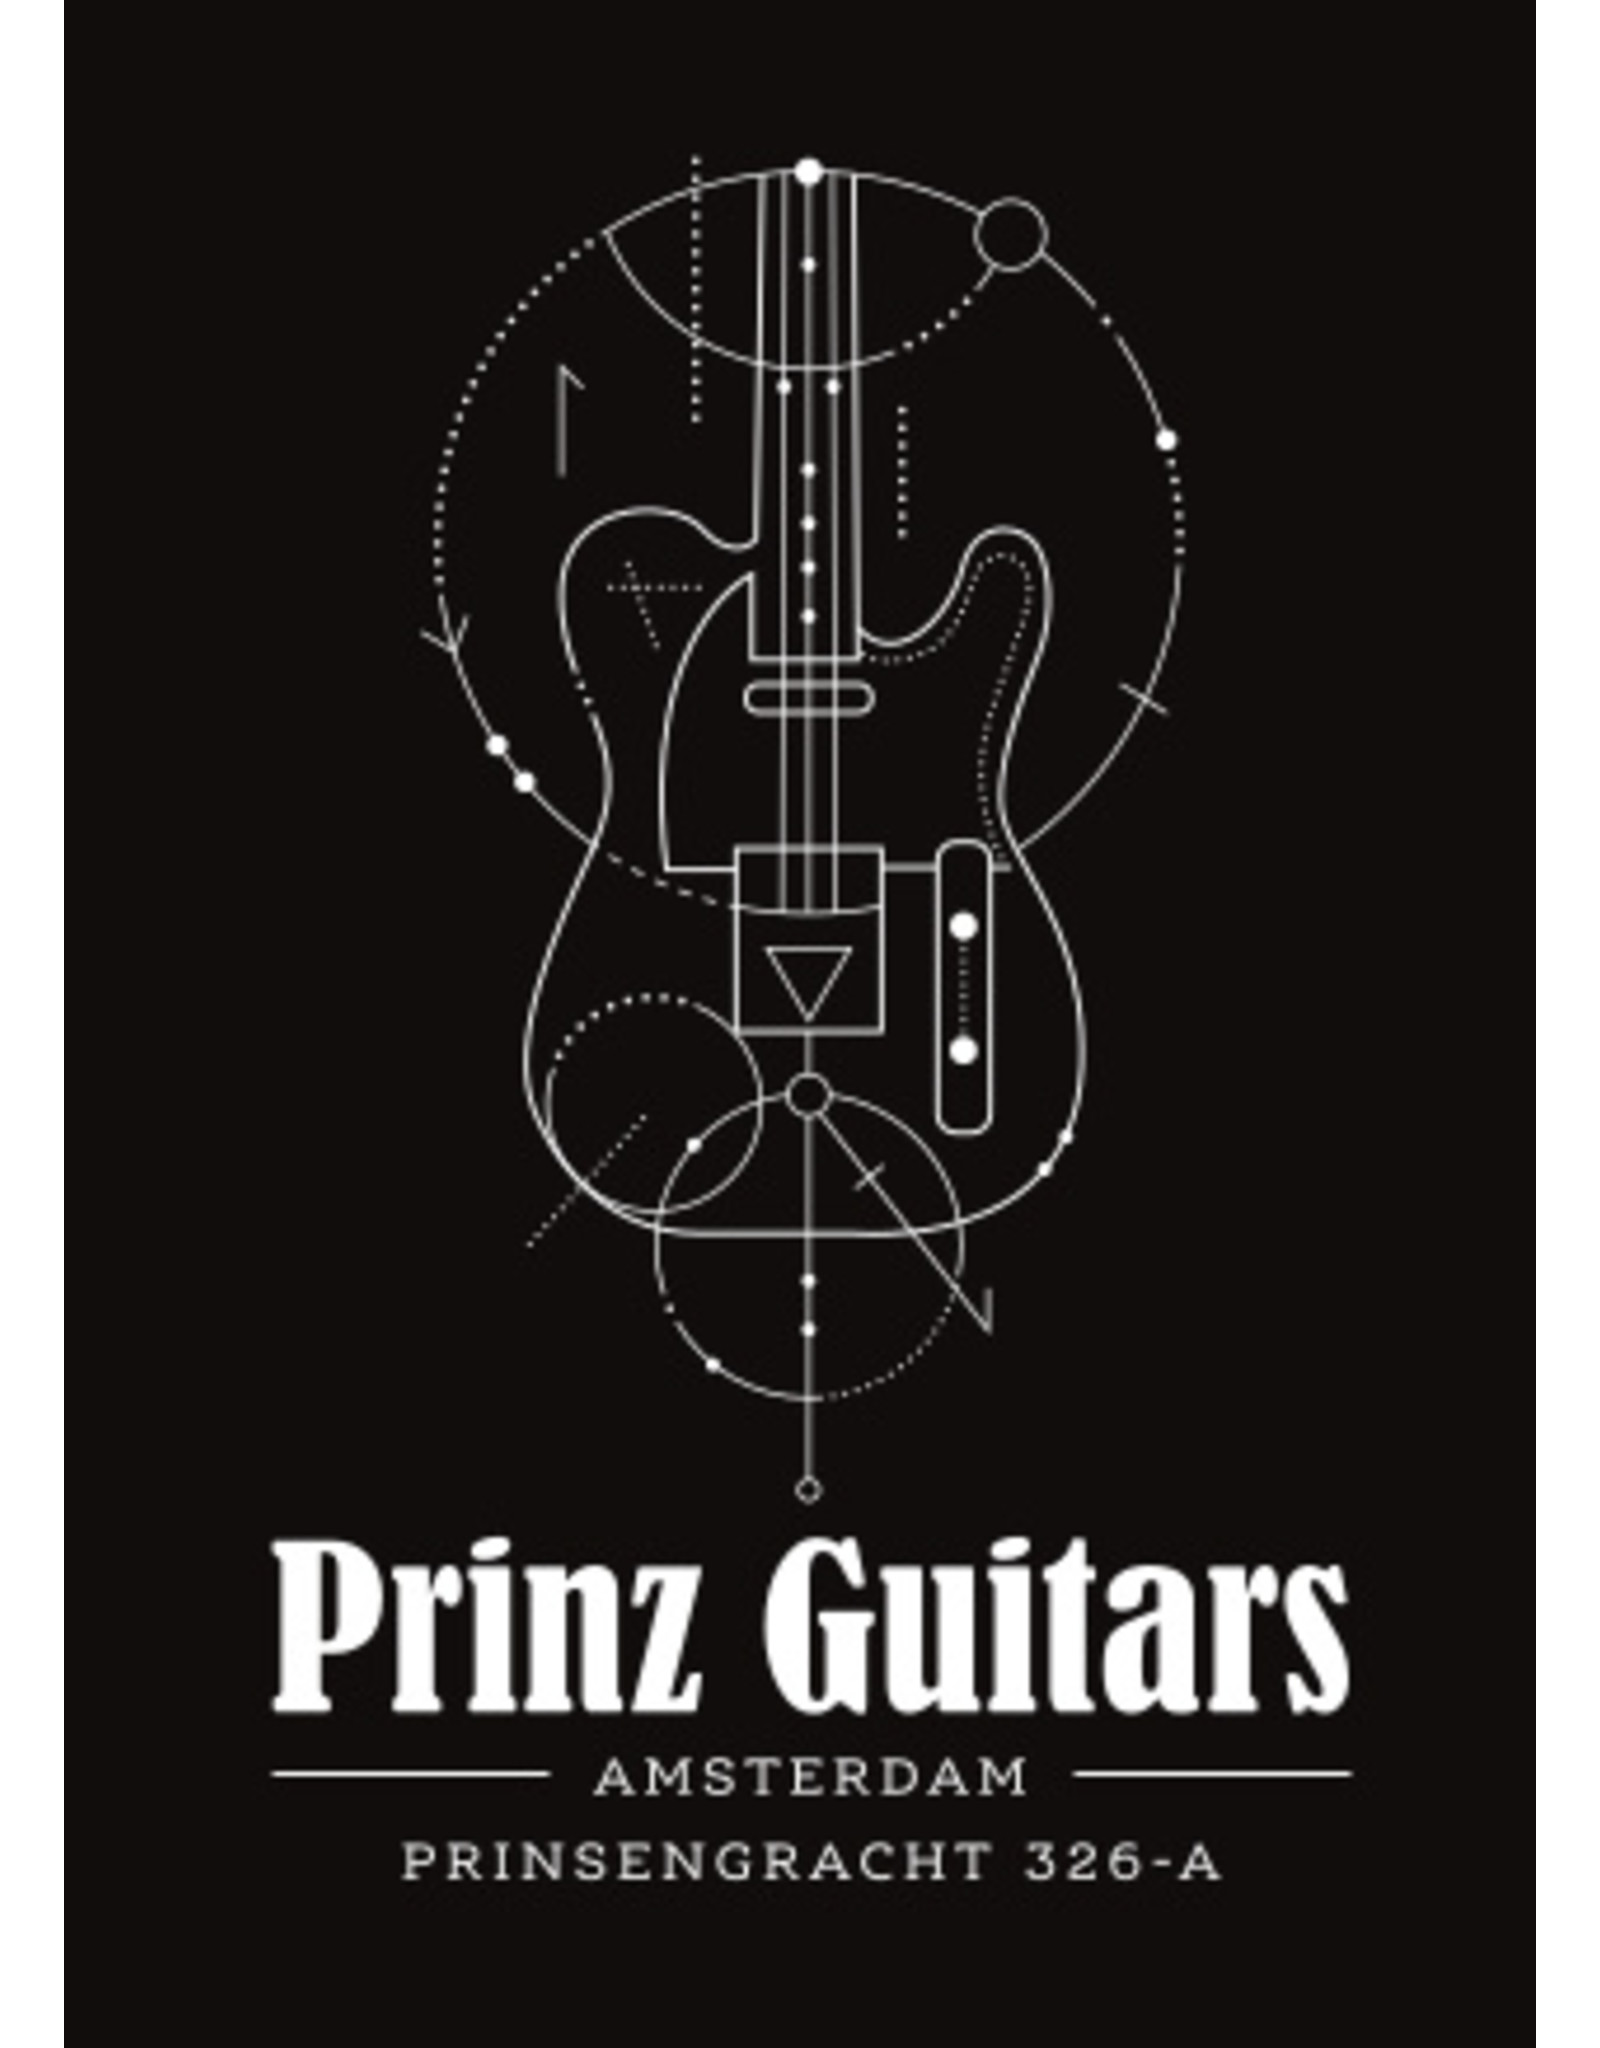 Prinz Guitars CadeauBon